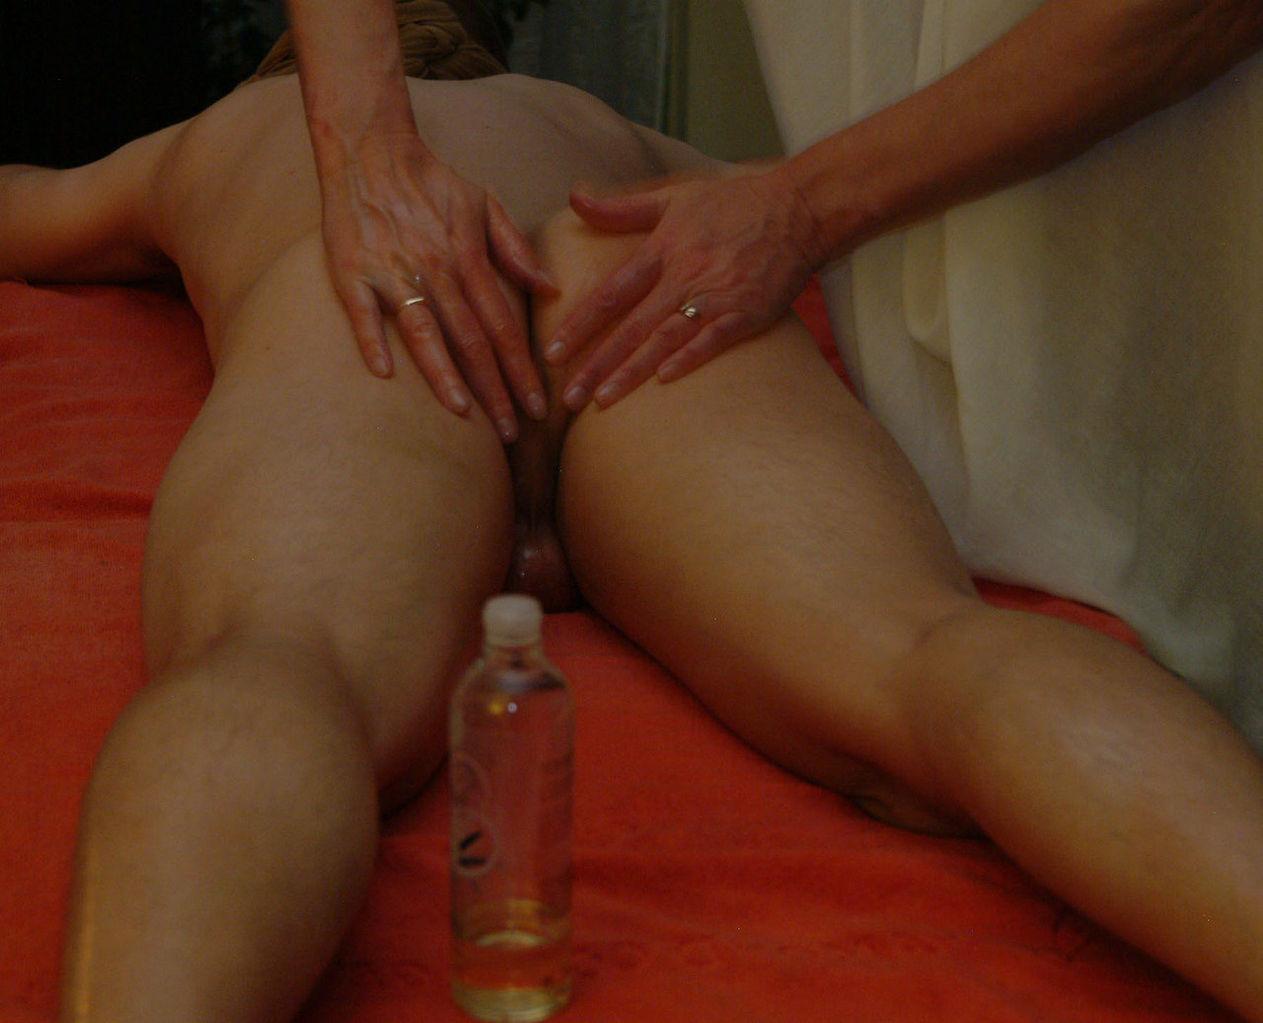 escort i danmark intim massage nordsjælland free fetish dating